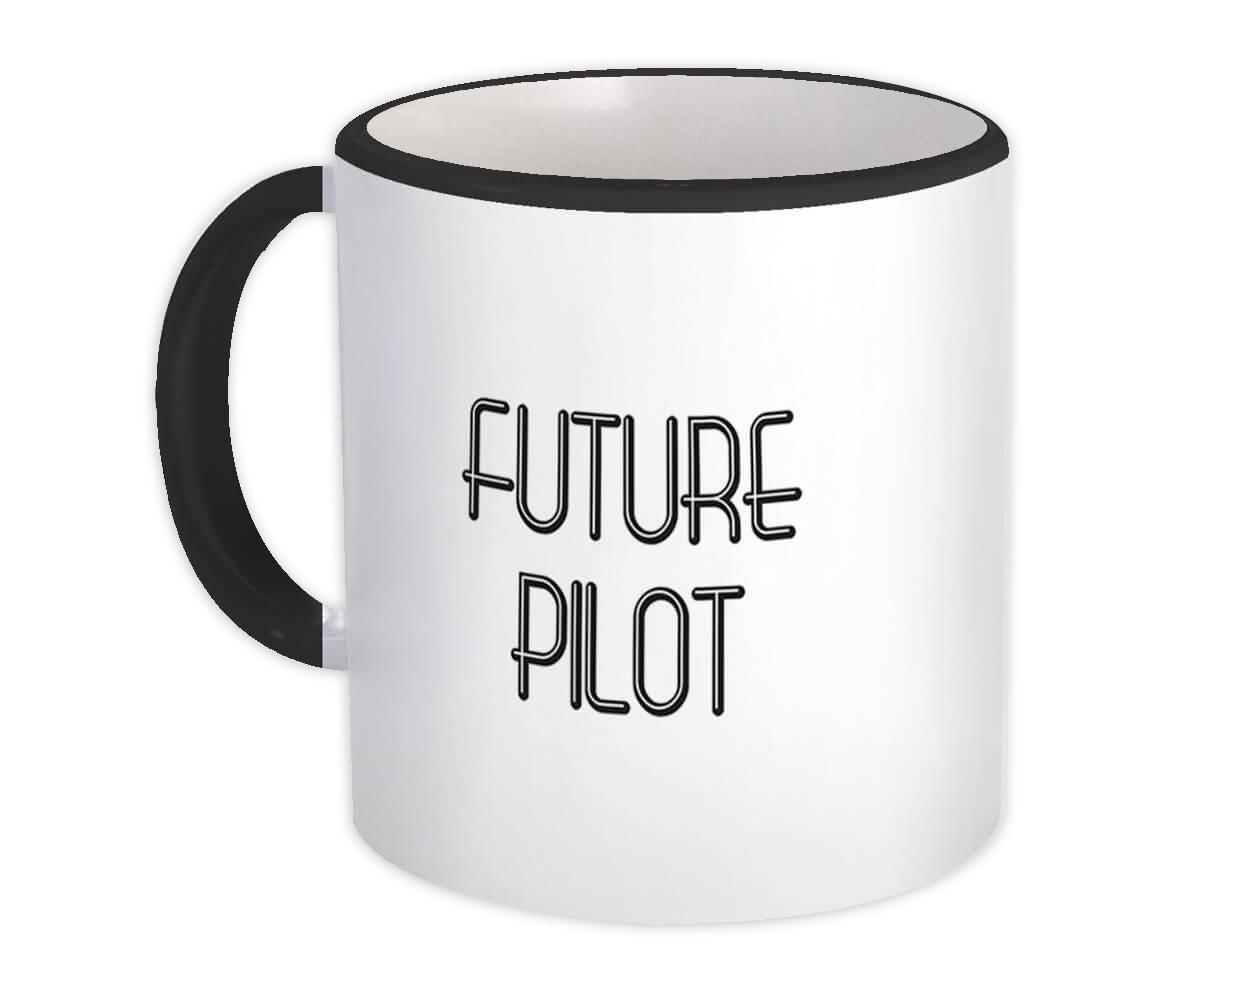 Future PILOT : Gift Mug Profession Office Birthday Christmas Coworker